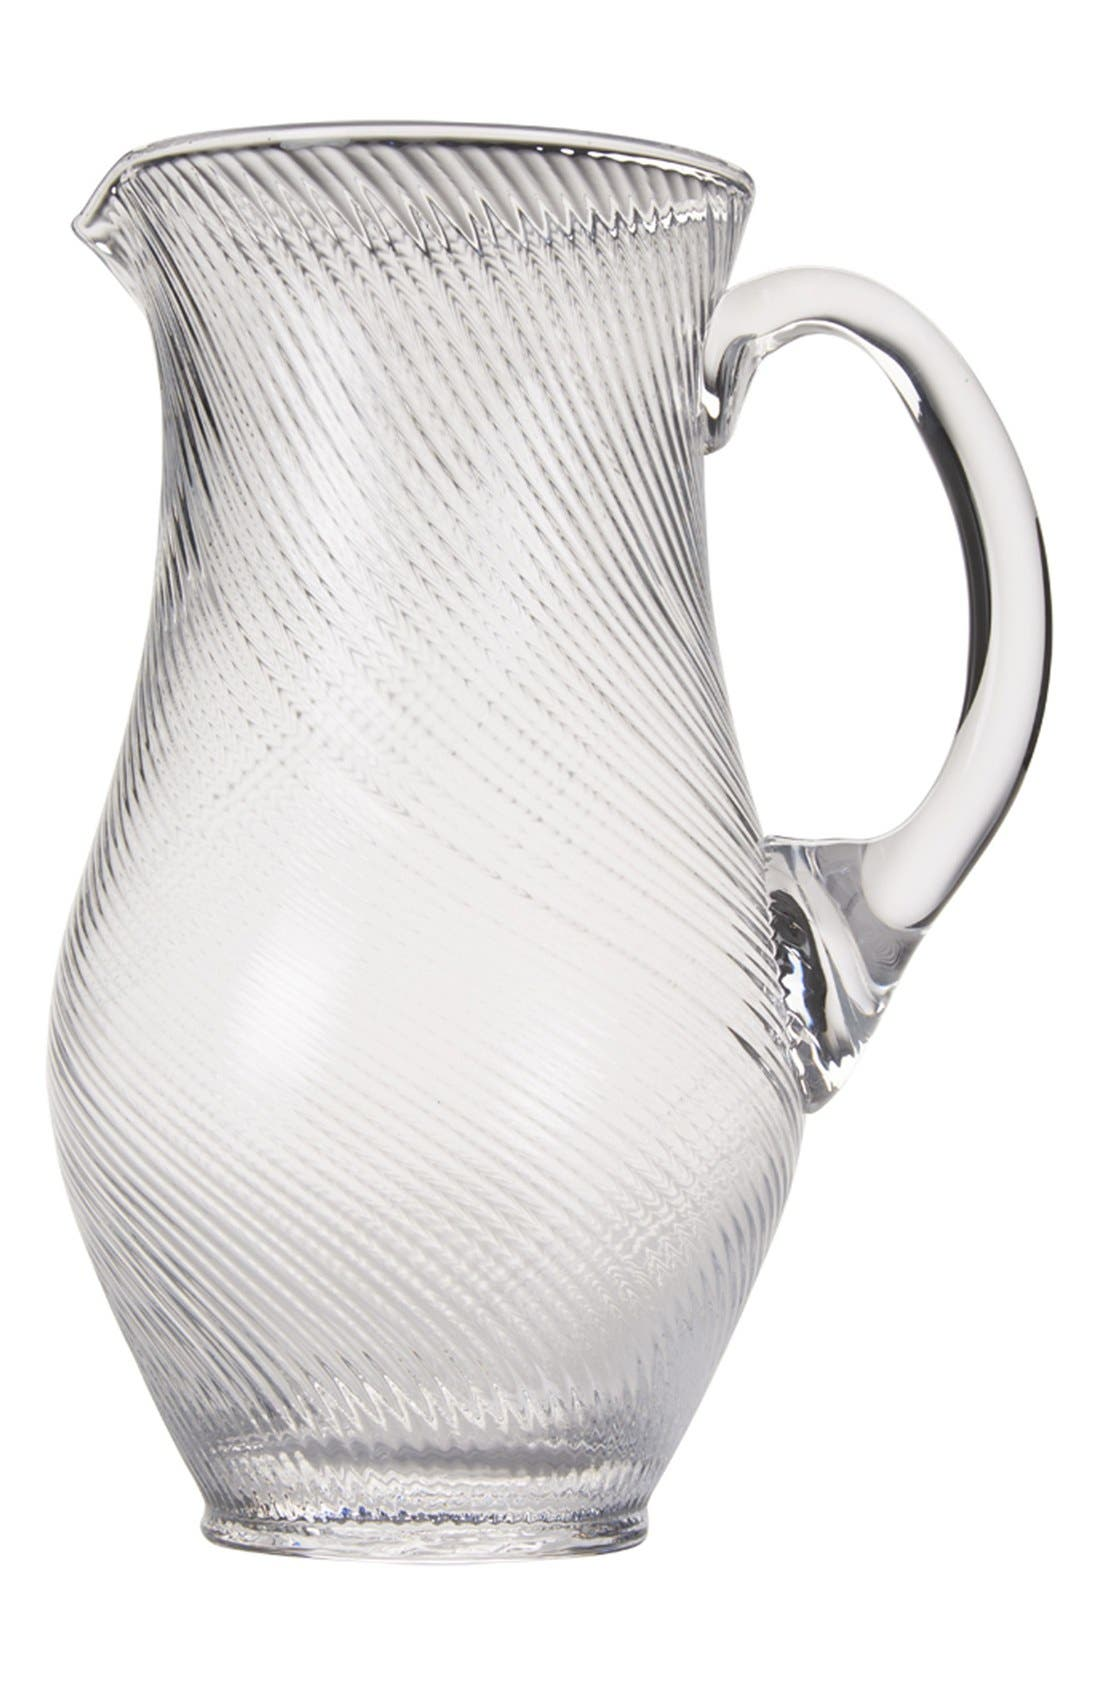 'Arabella' Glass Pitcher,                             Main thumbnail 1, color,                             100